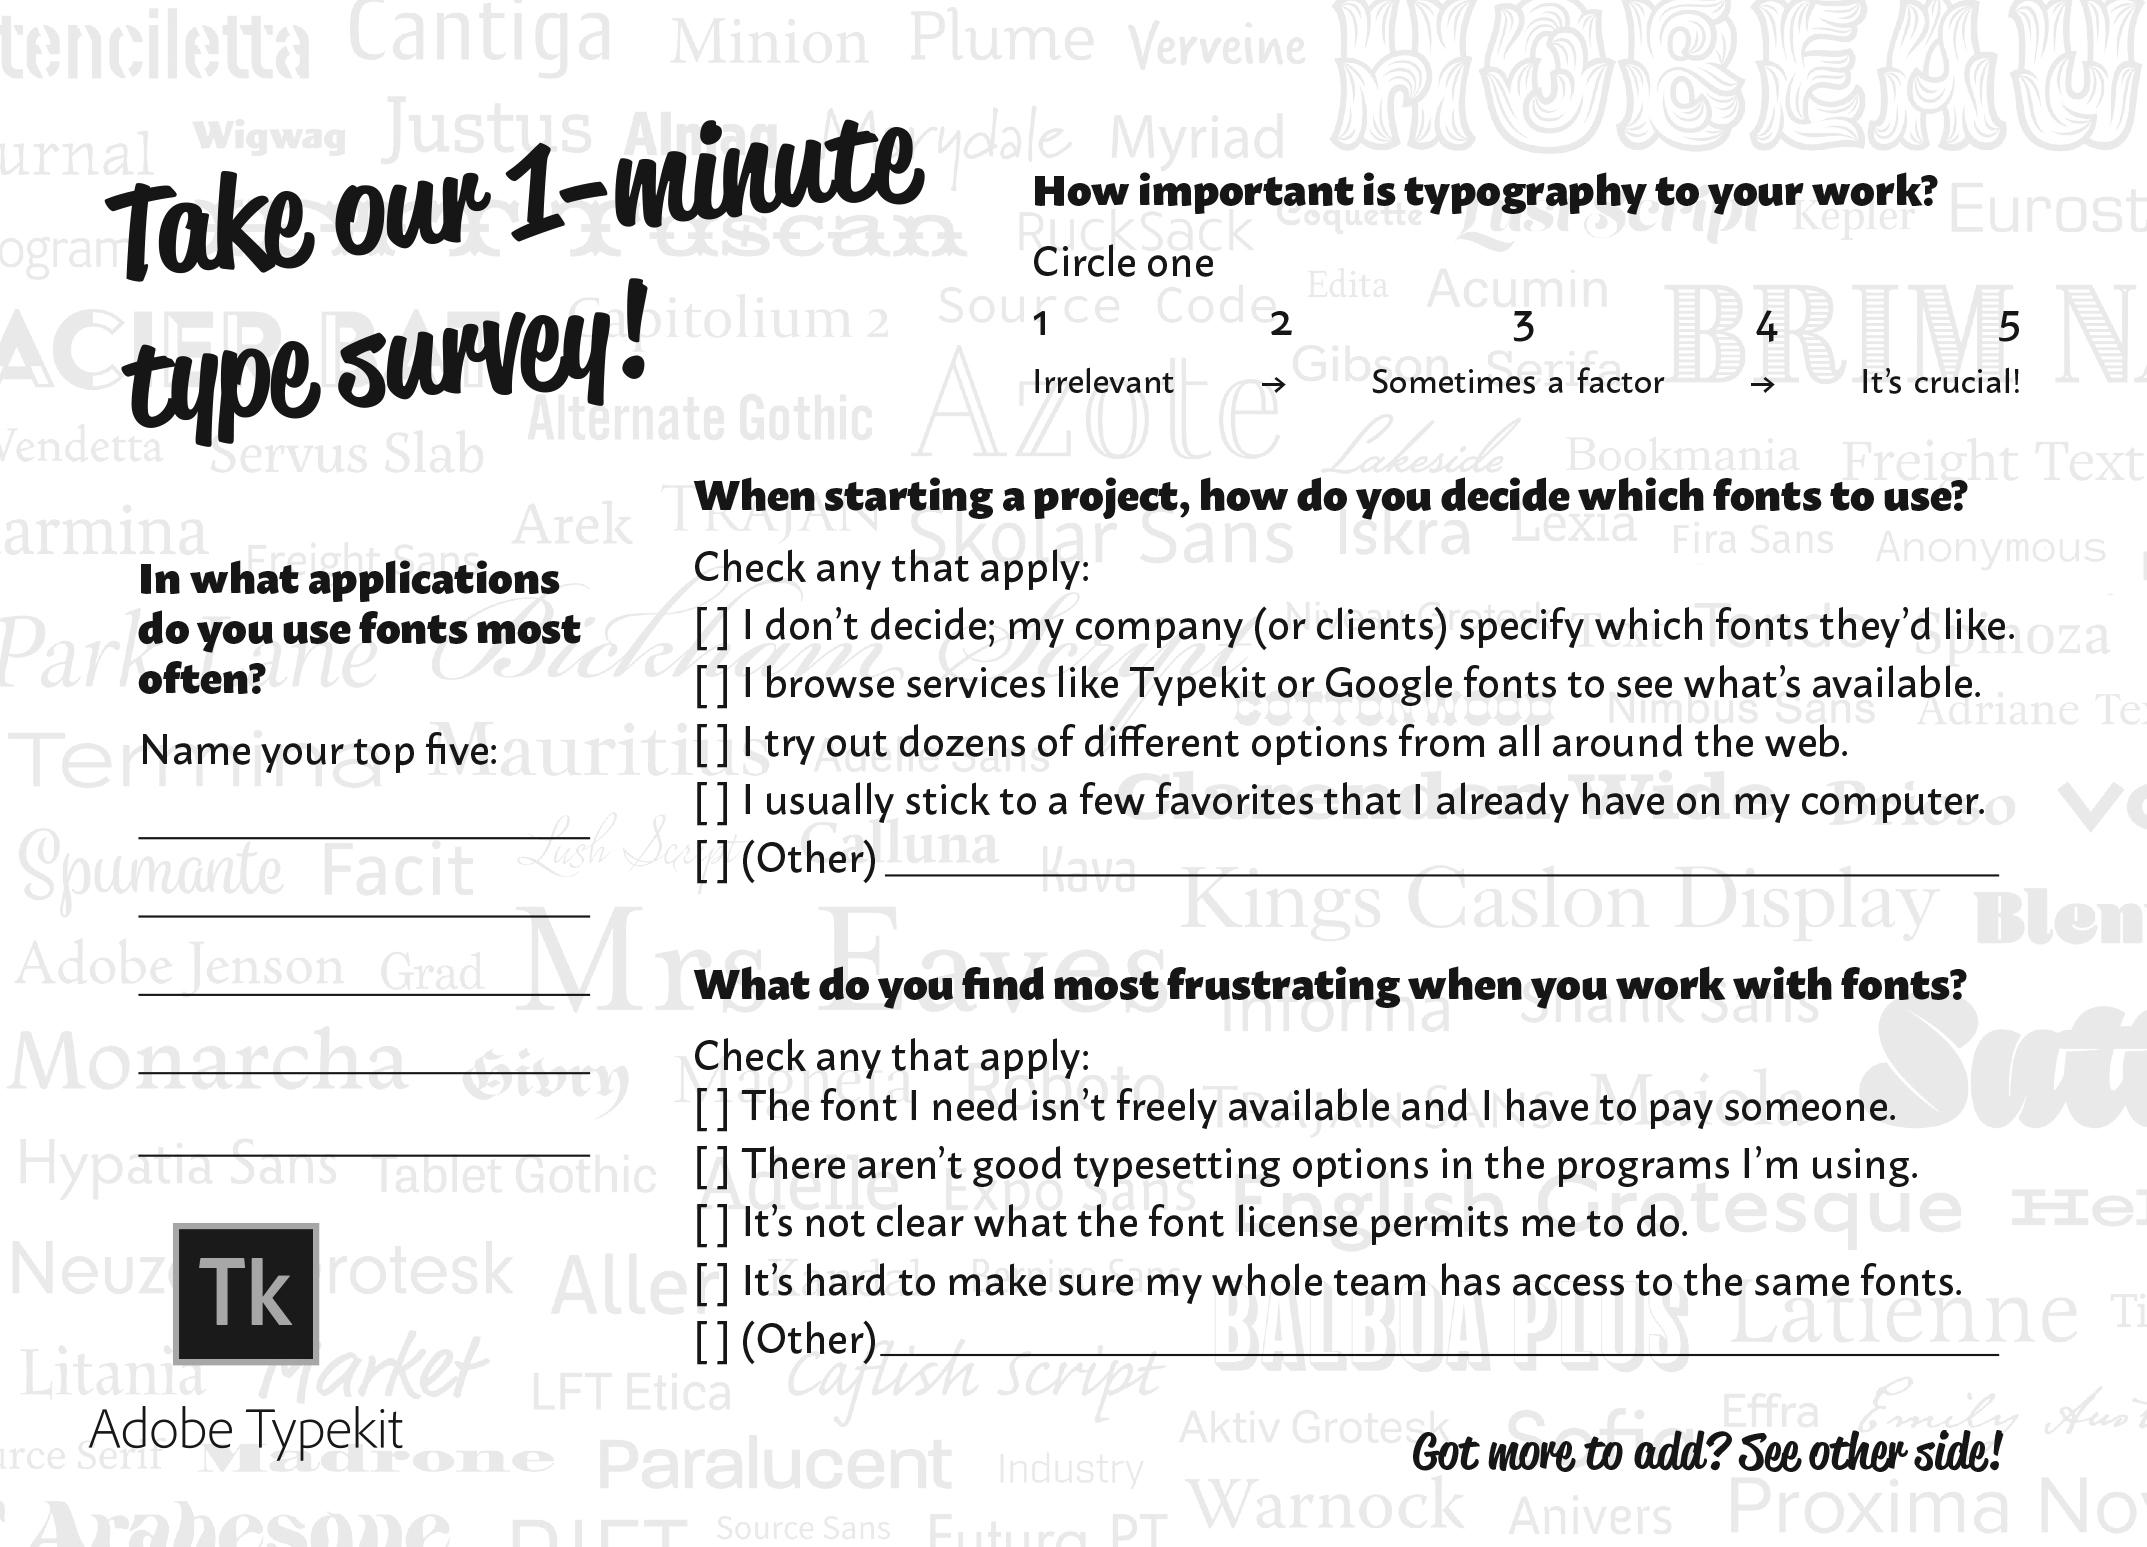 MAX customer research postcard final-1.jpg